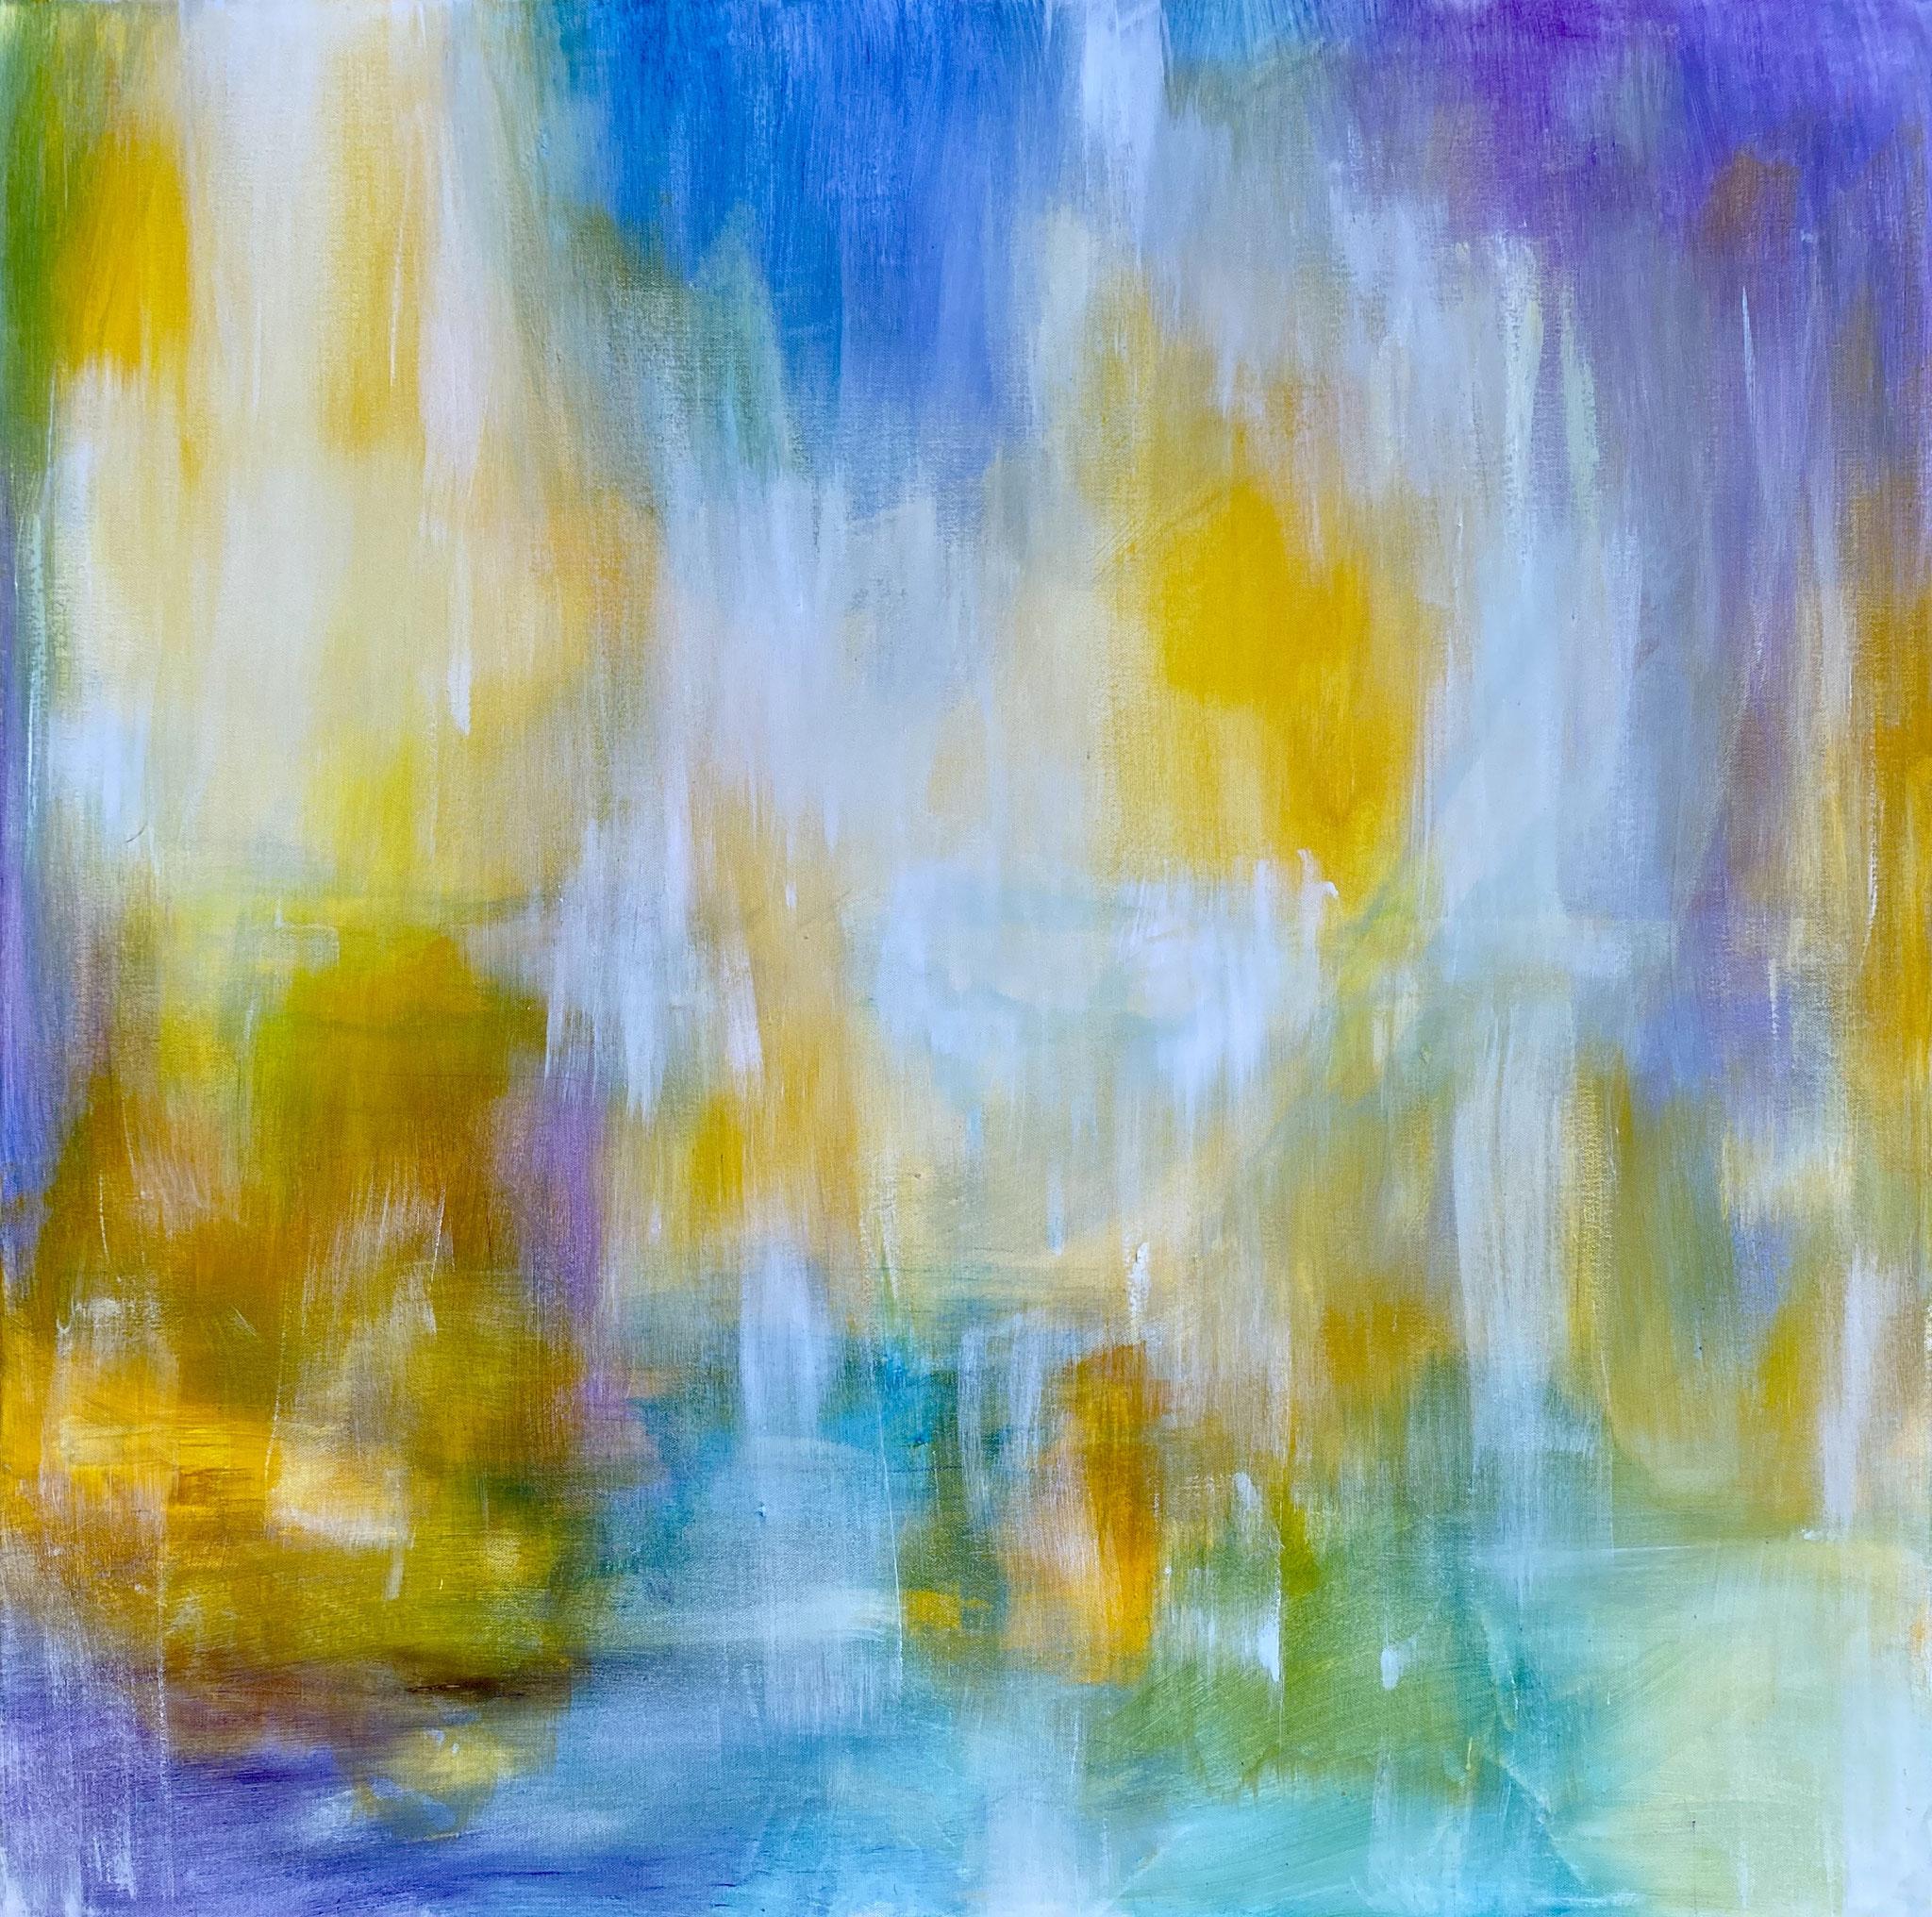 Spiegelung 3 | 100 x 100cm | Acryl auf Leinwand | 2020